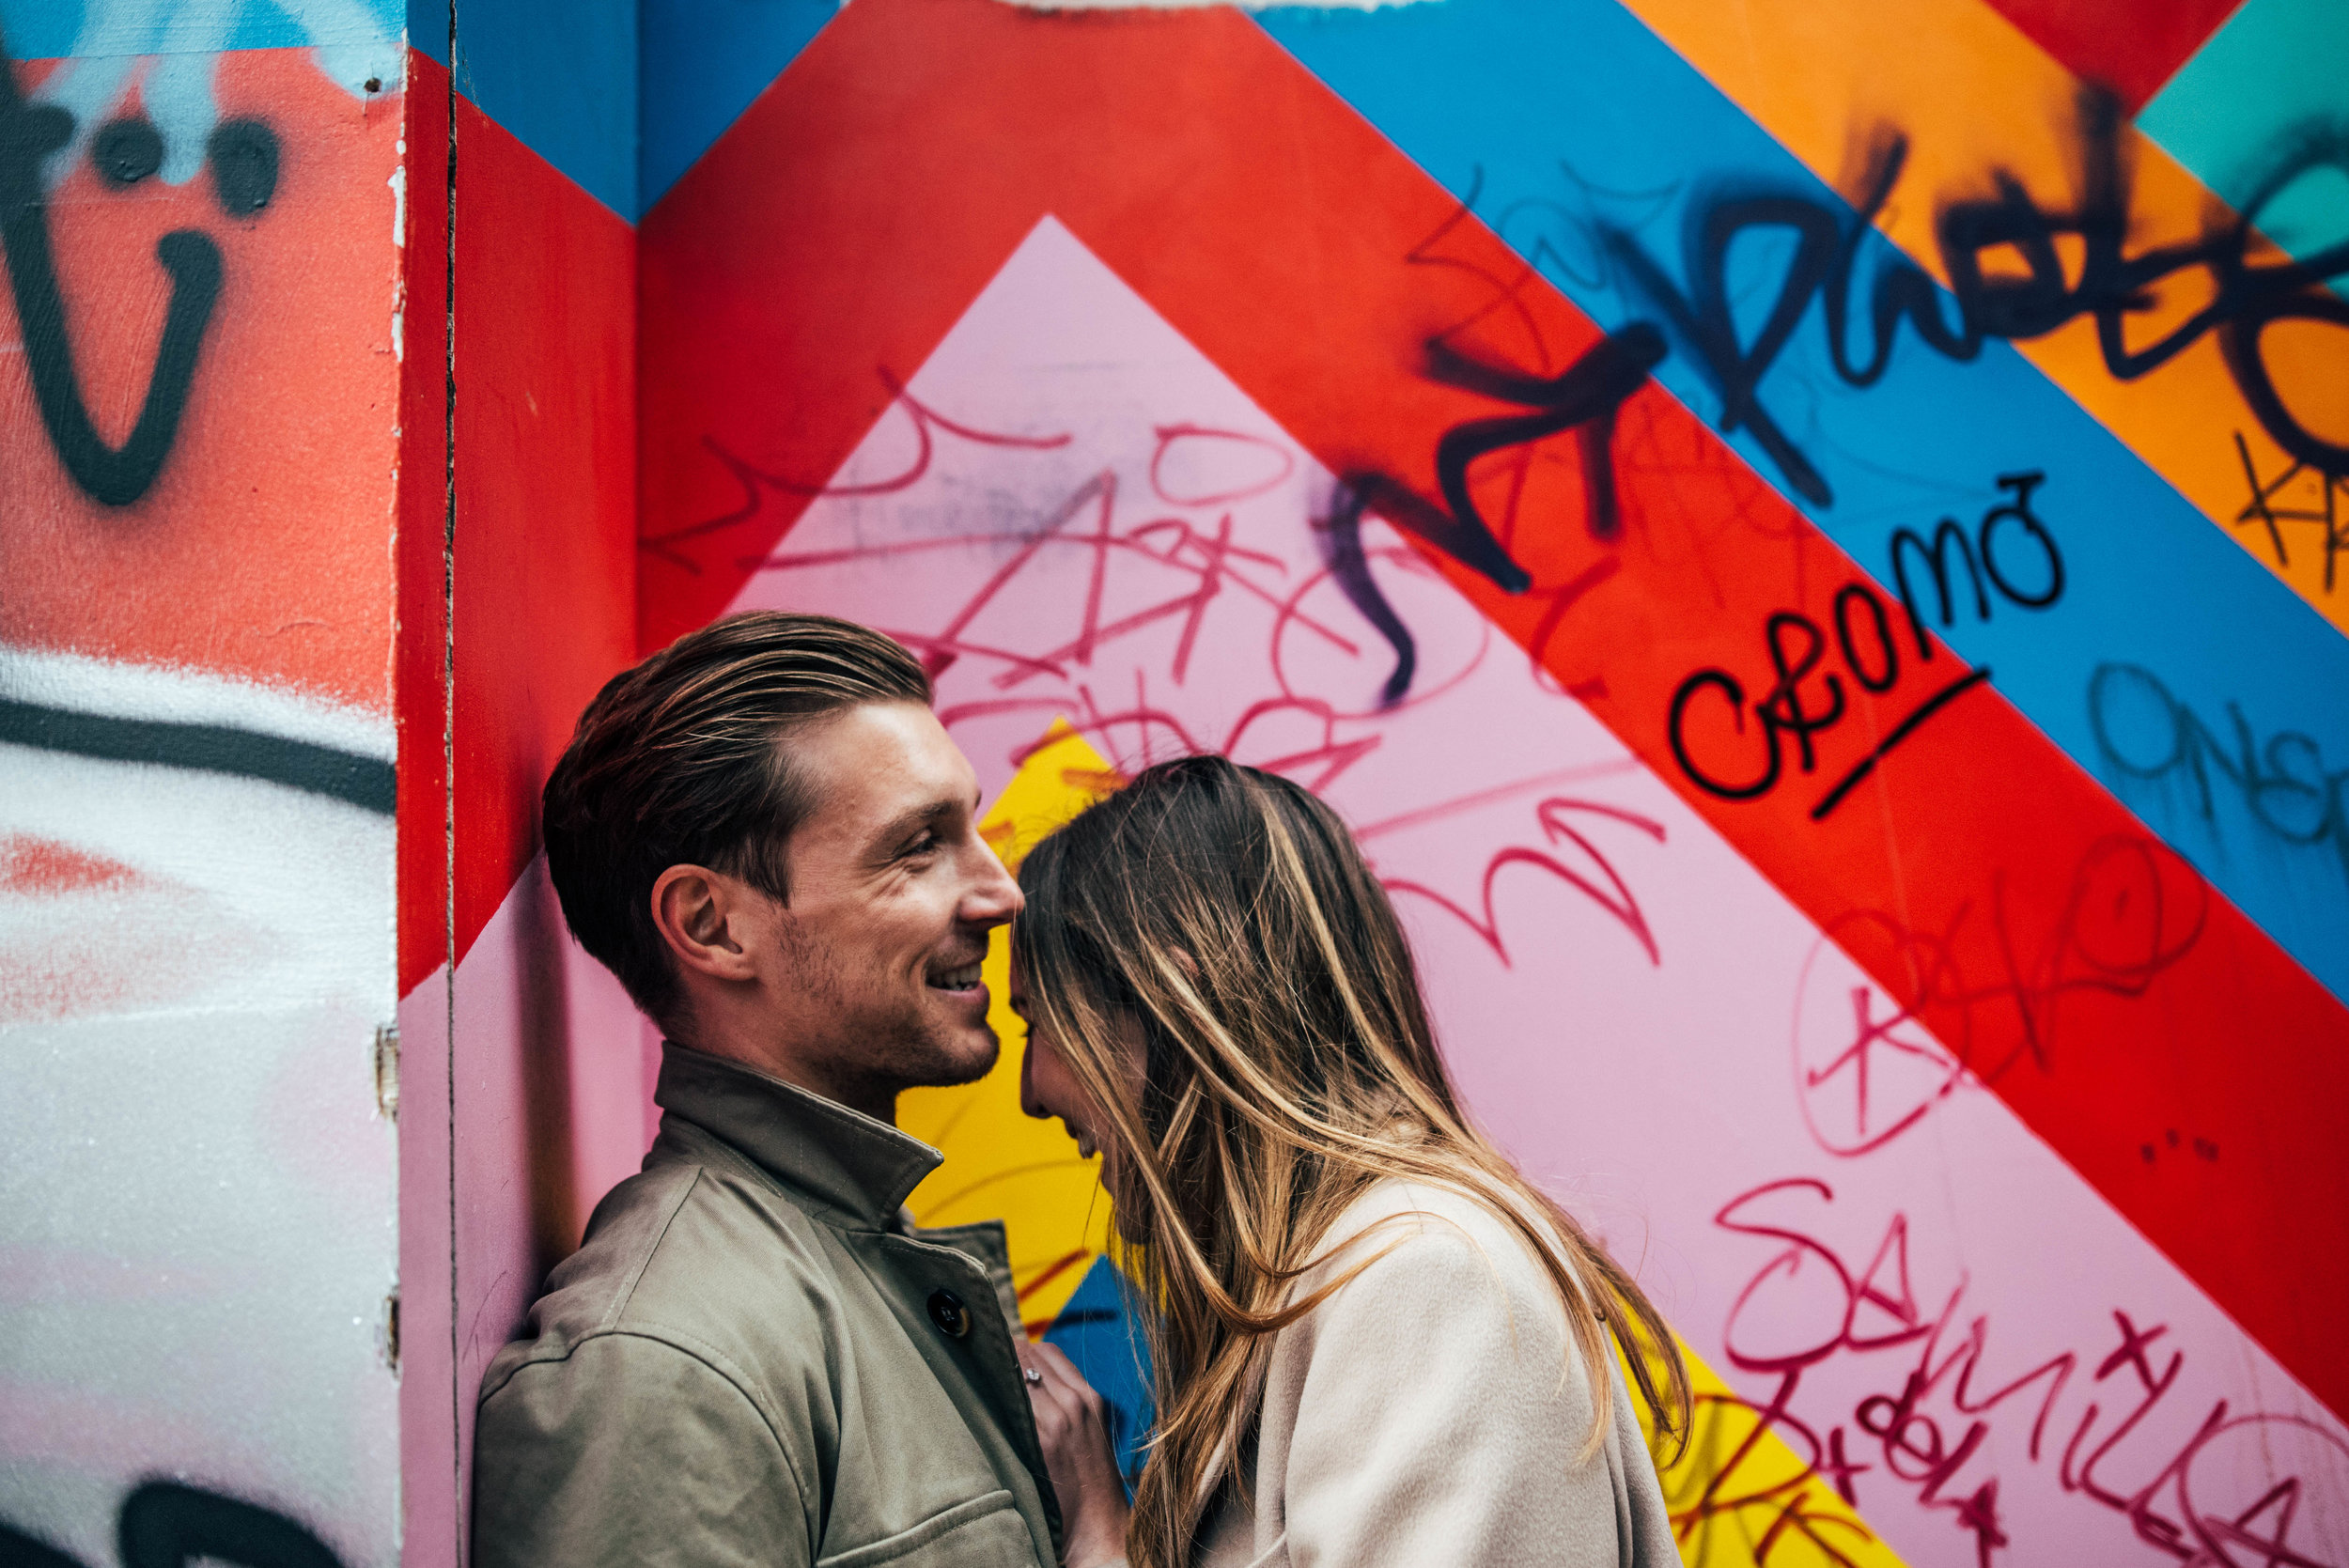 Modern Urban Shoreditch Love Shoot Graffiti Essex UK Documentary Wedding Photographer